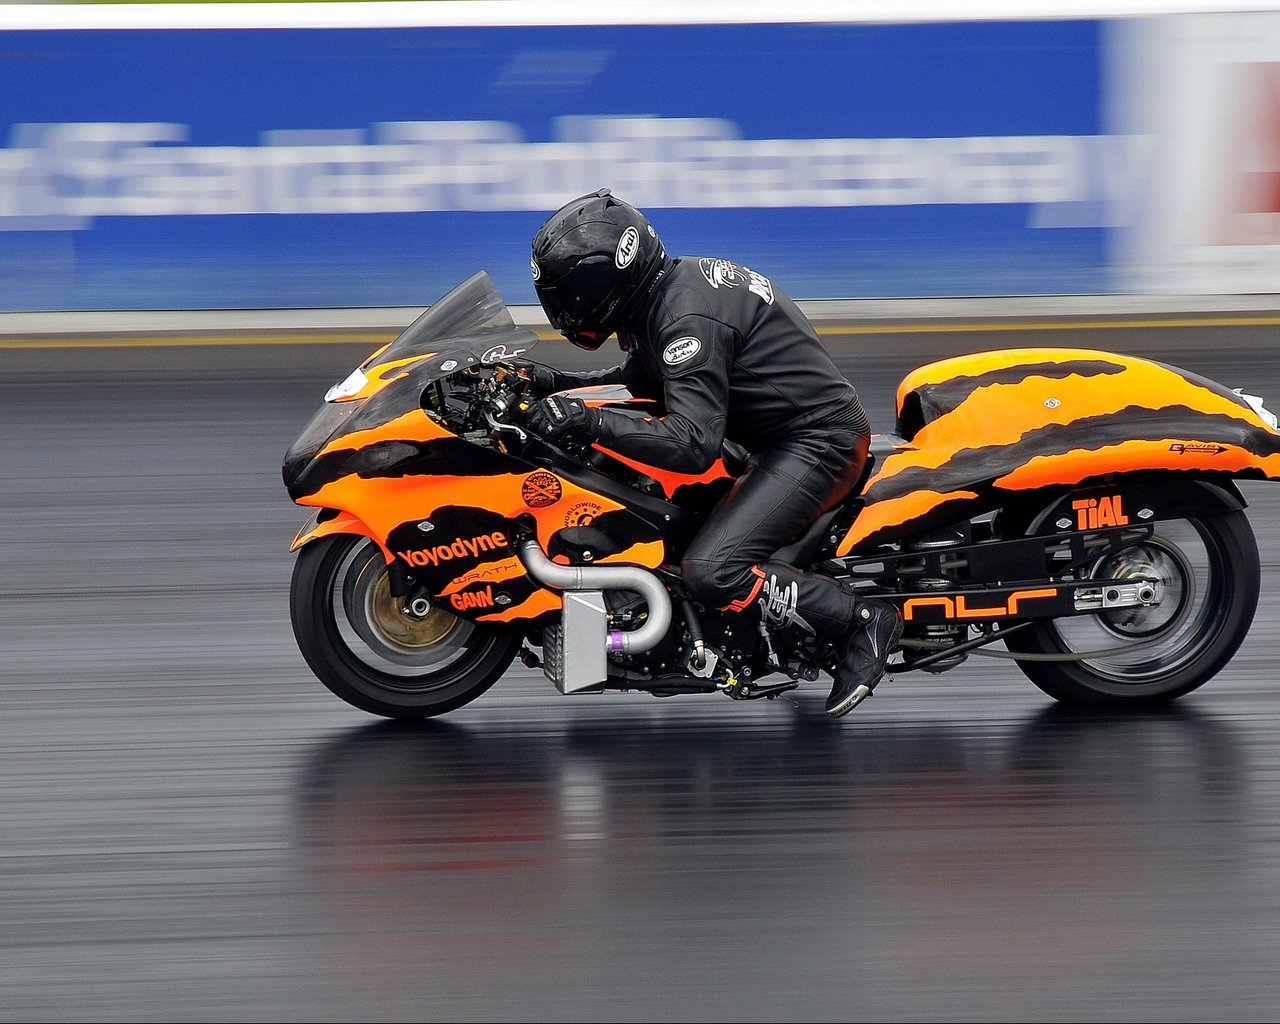 Download wallpaper 1280x1024 motorcycle bike racing sports 1280x1024